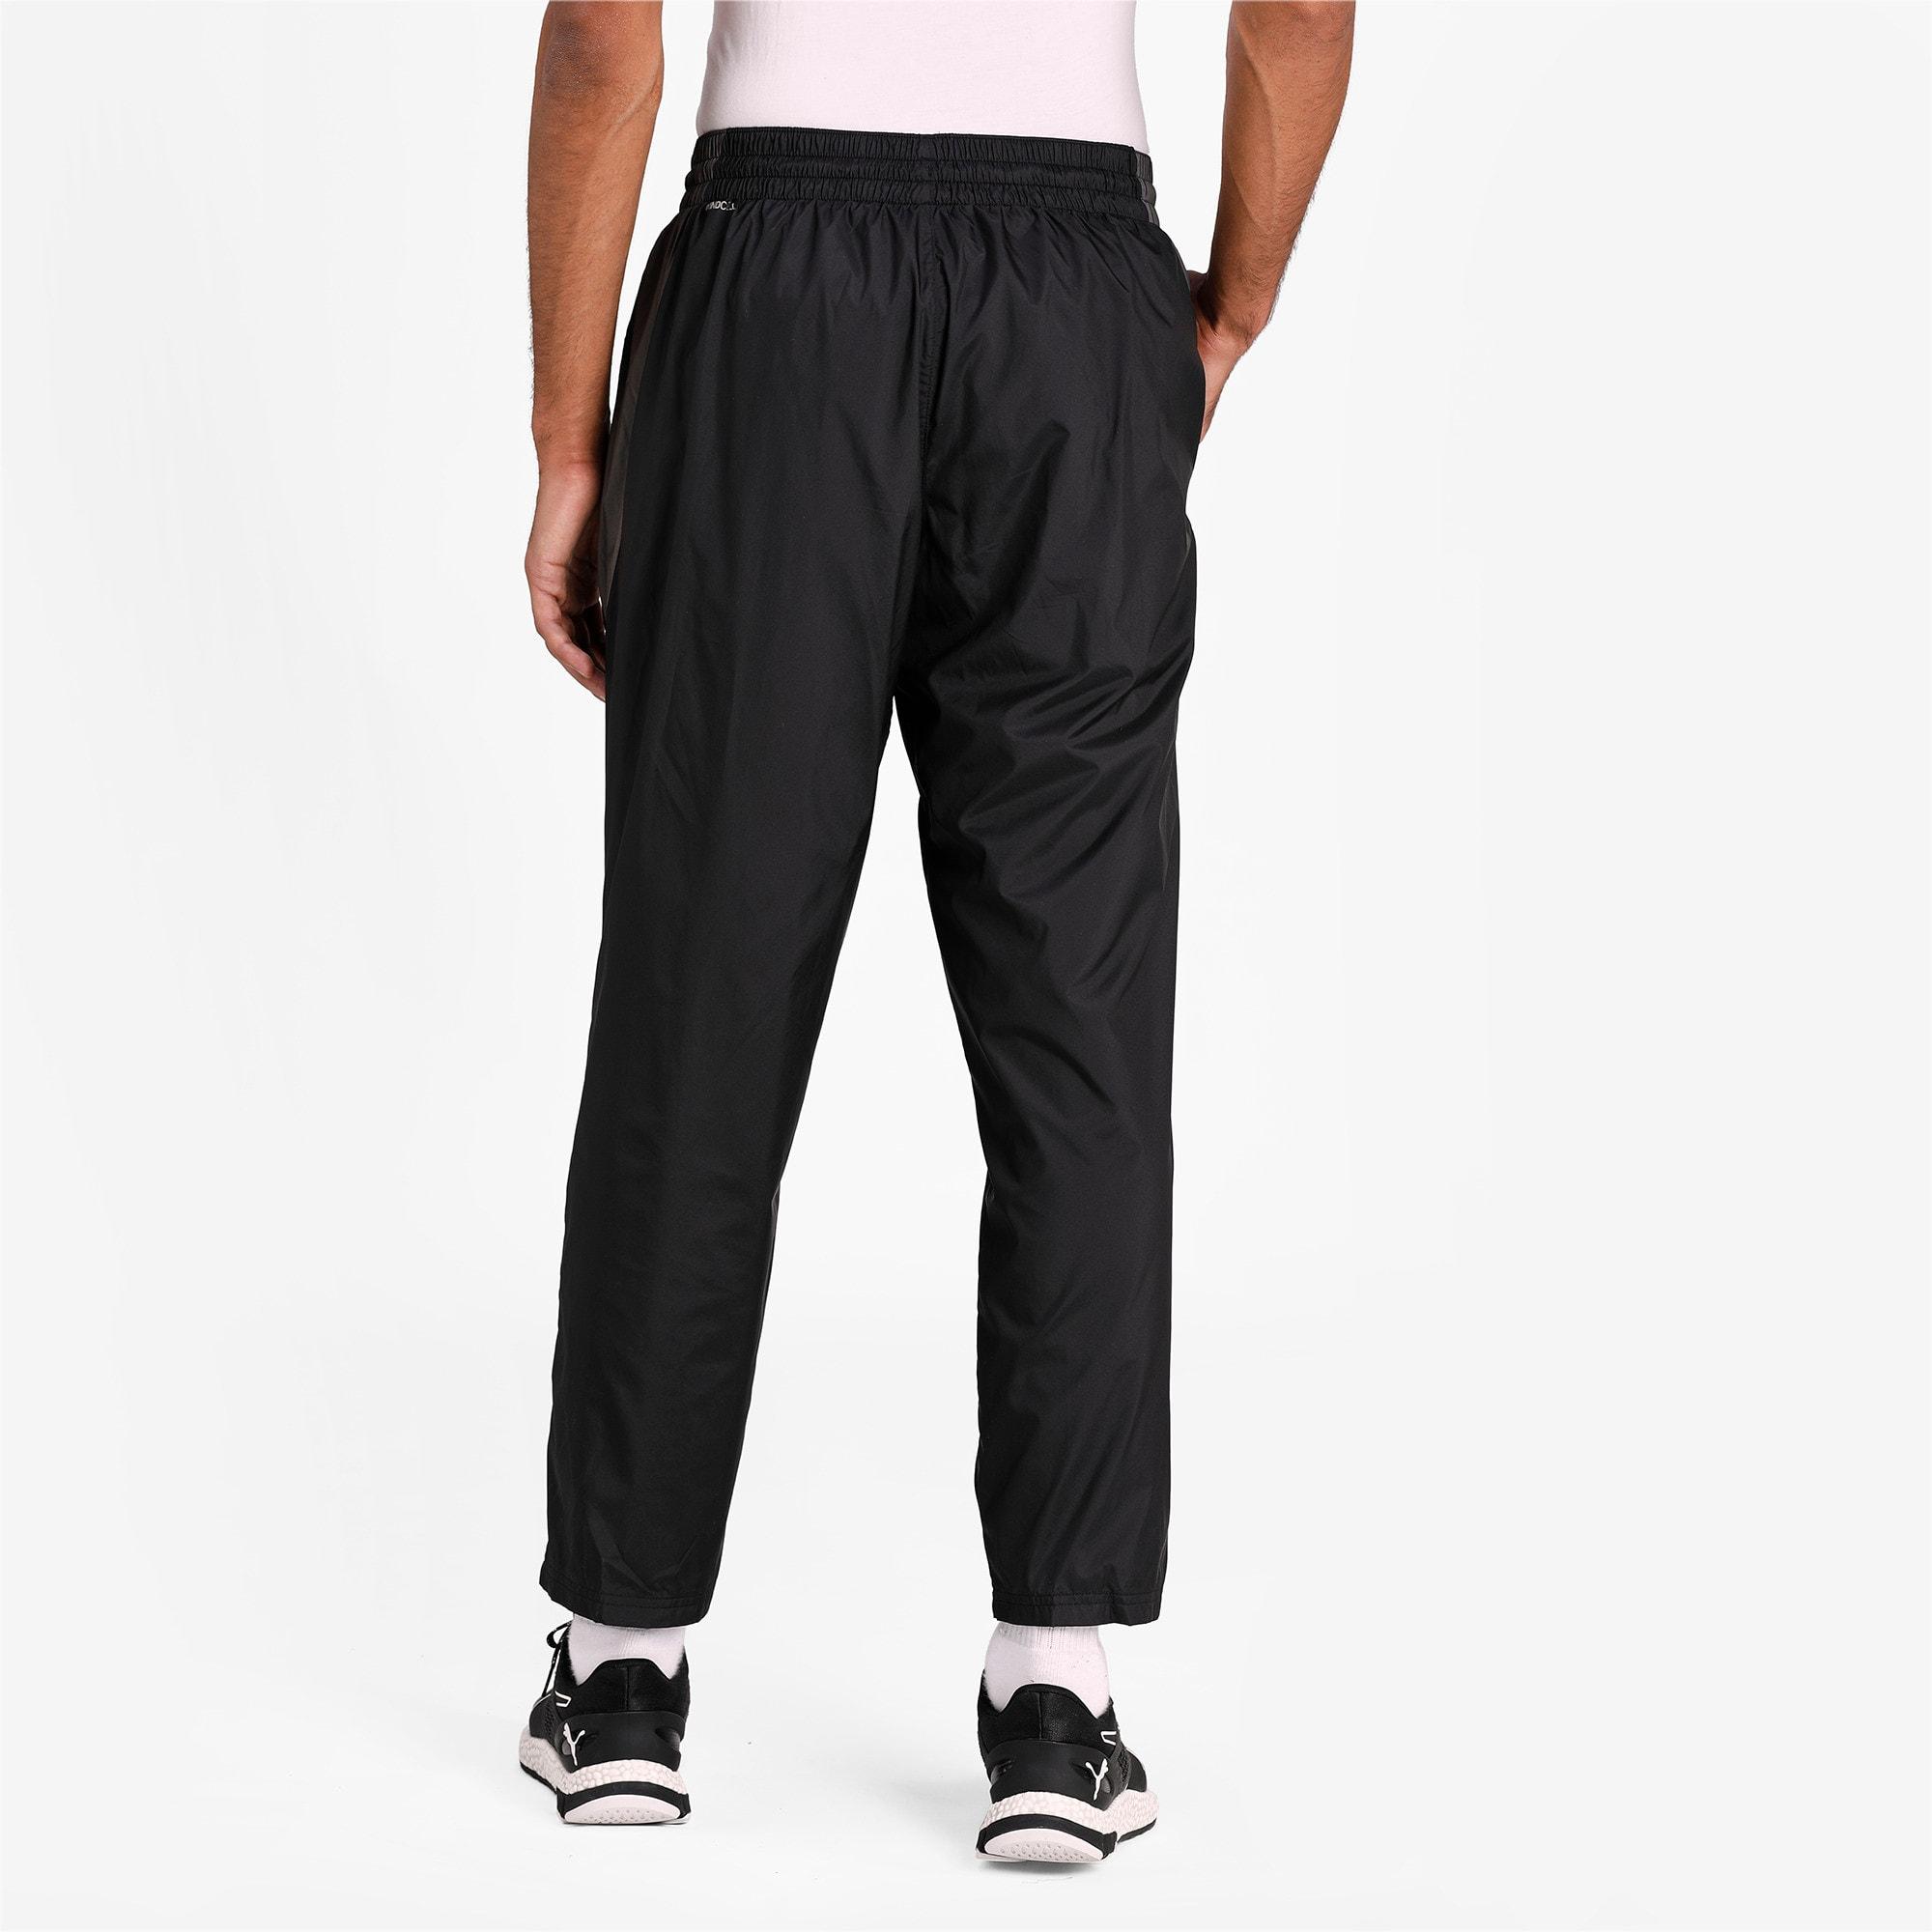 Thumbnail 2 of Reactive Woven Men's Training Pants, Puma Black-CASTLEROCK, medium-IND